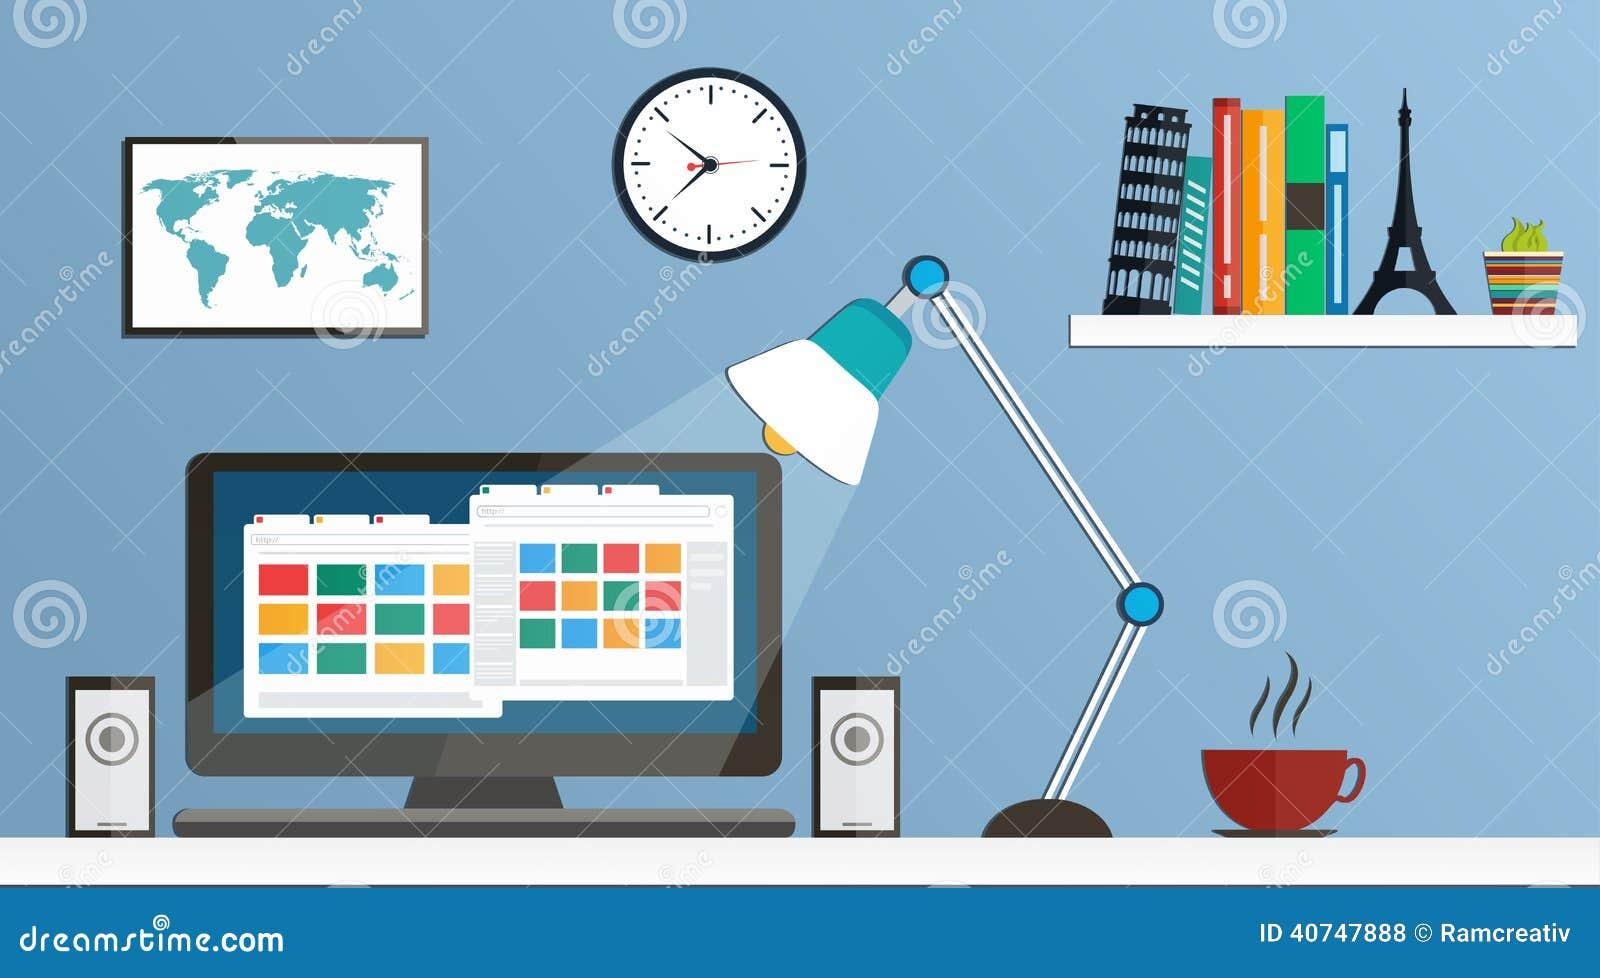 Flat design desktop, workspace